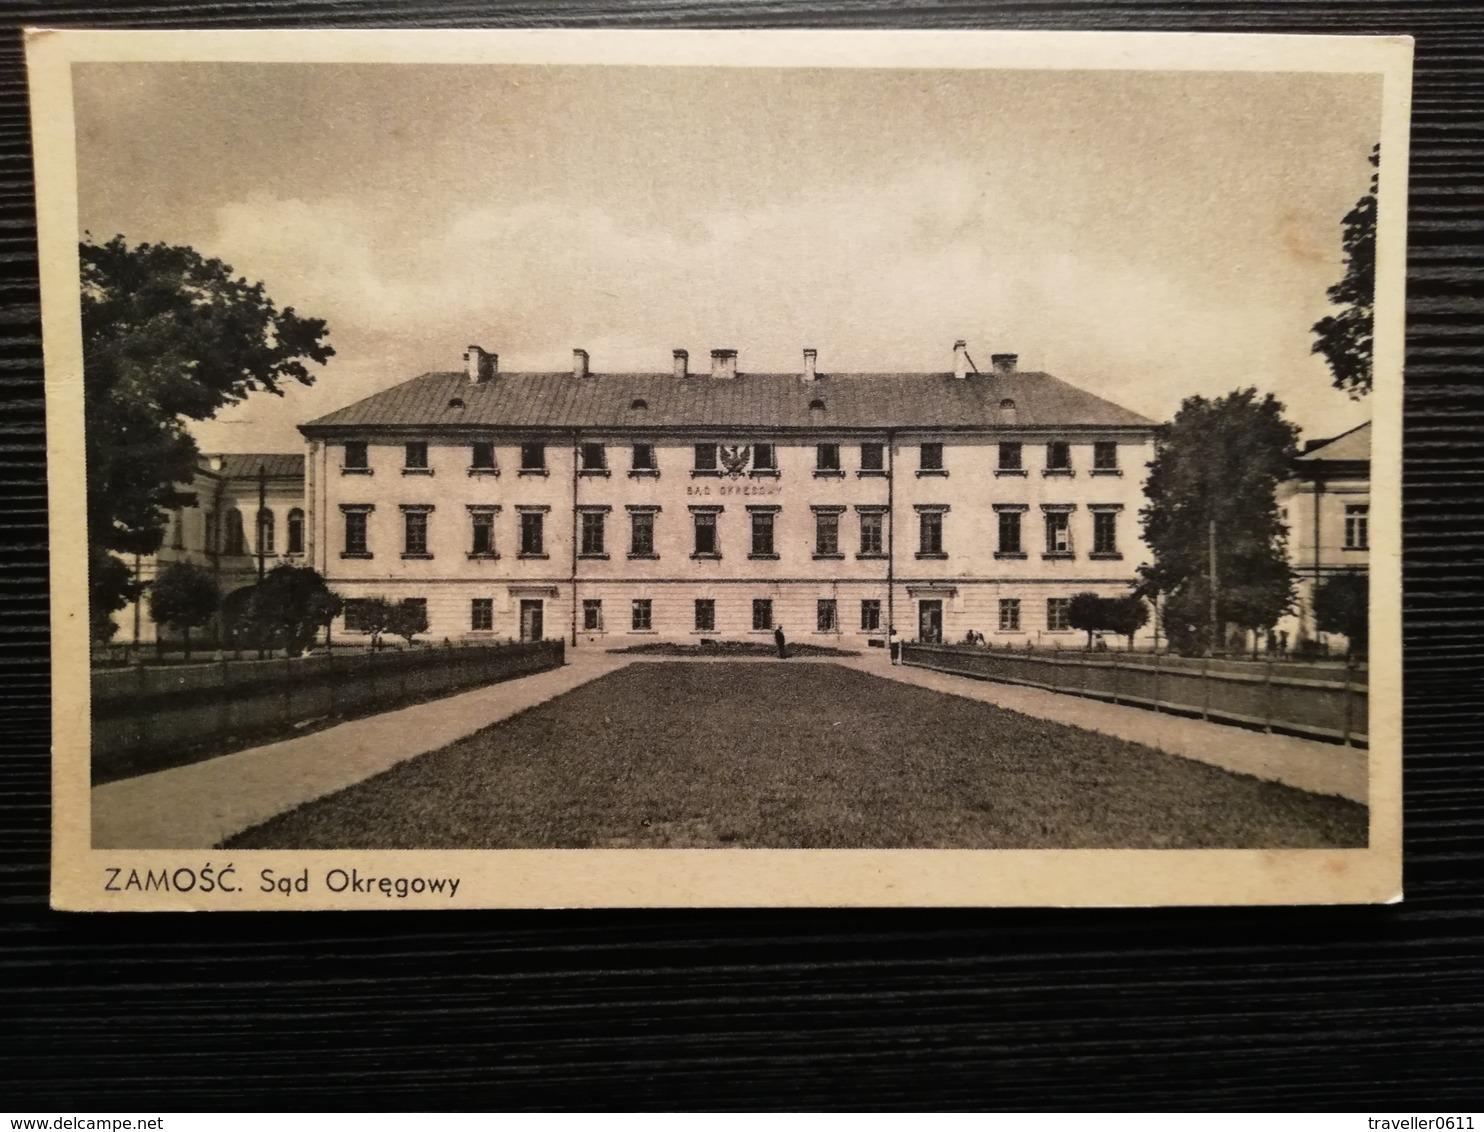 Zamosc, Sad Okregowy, Polen, Polska, 1930 - Pologne